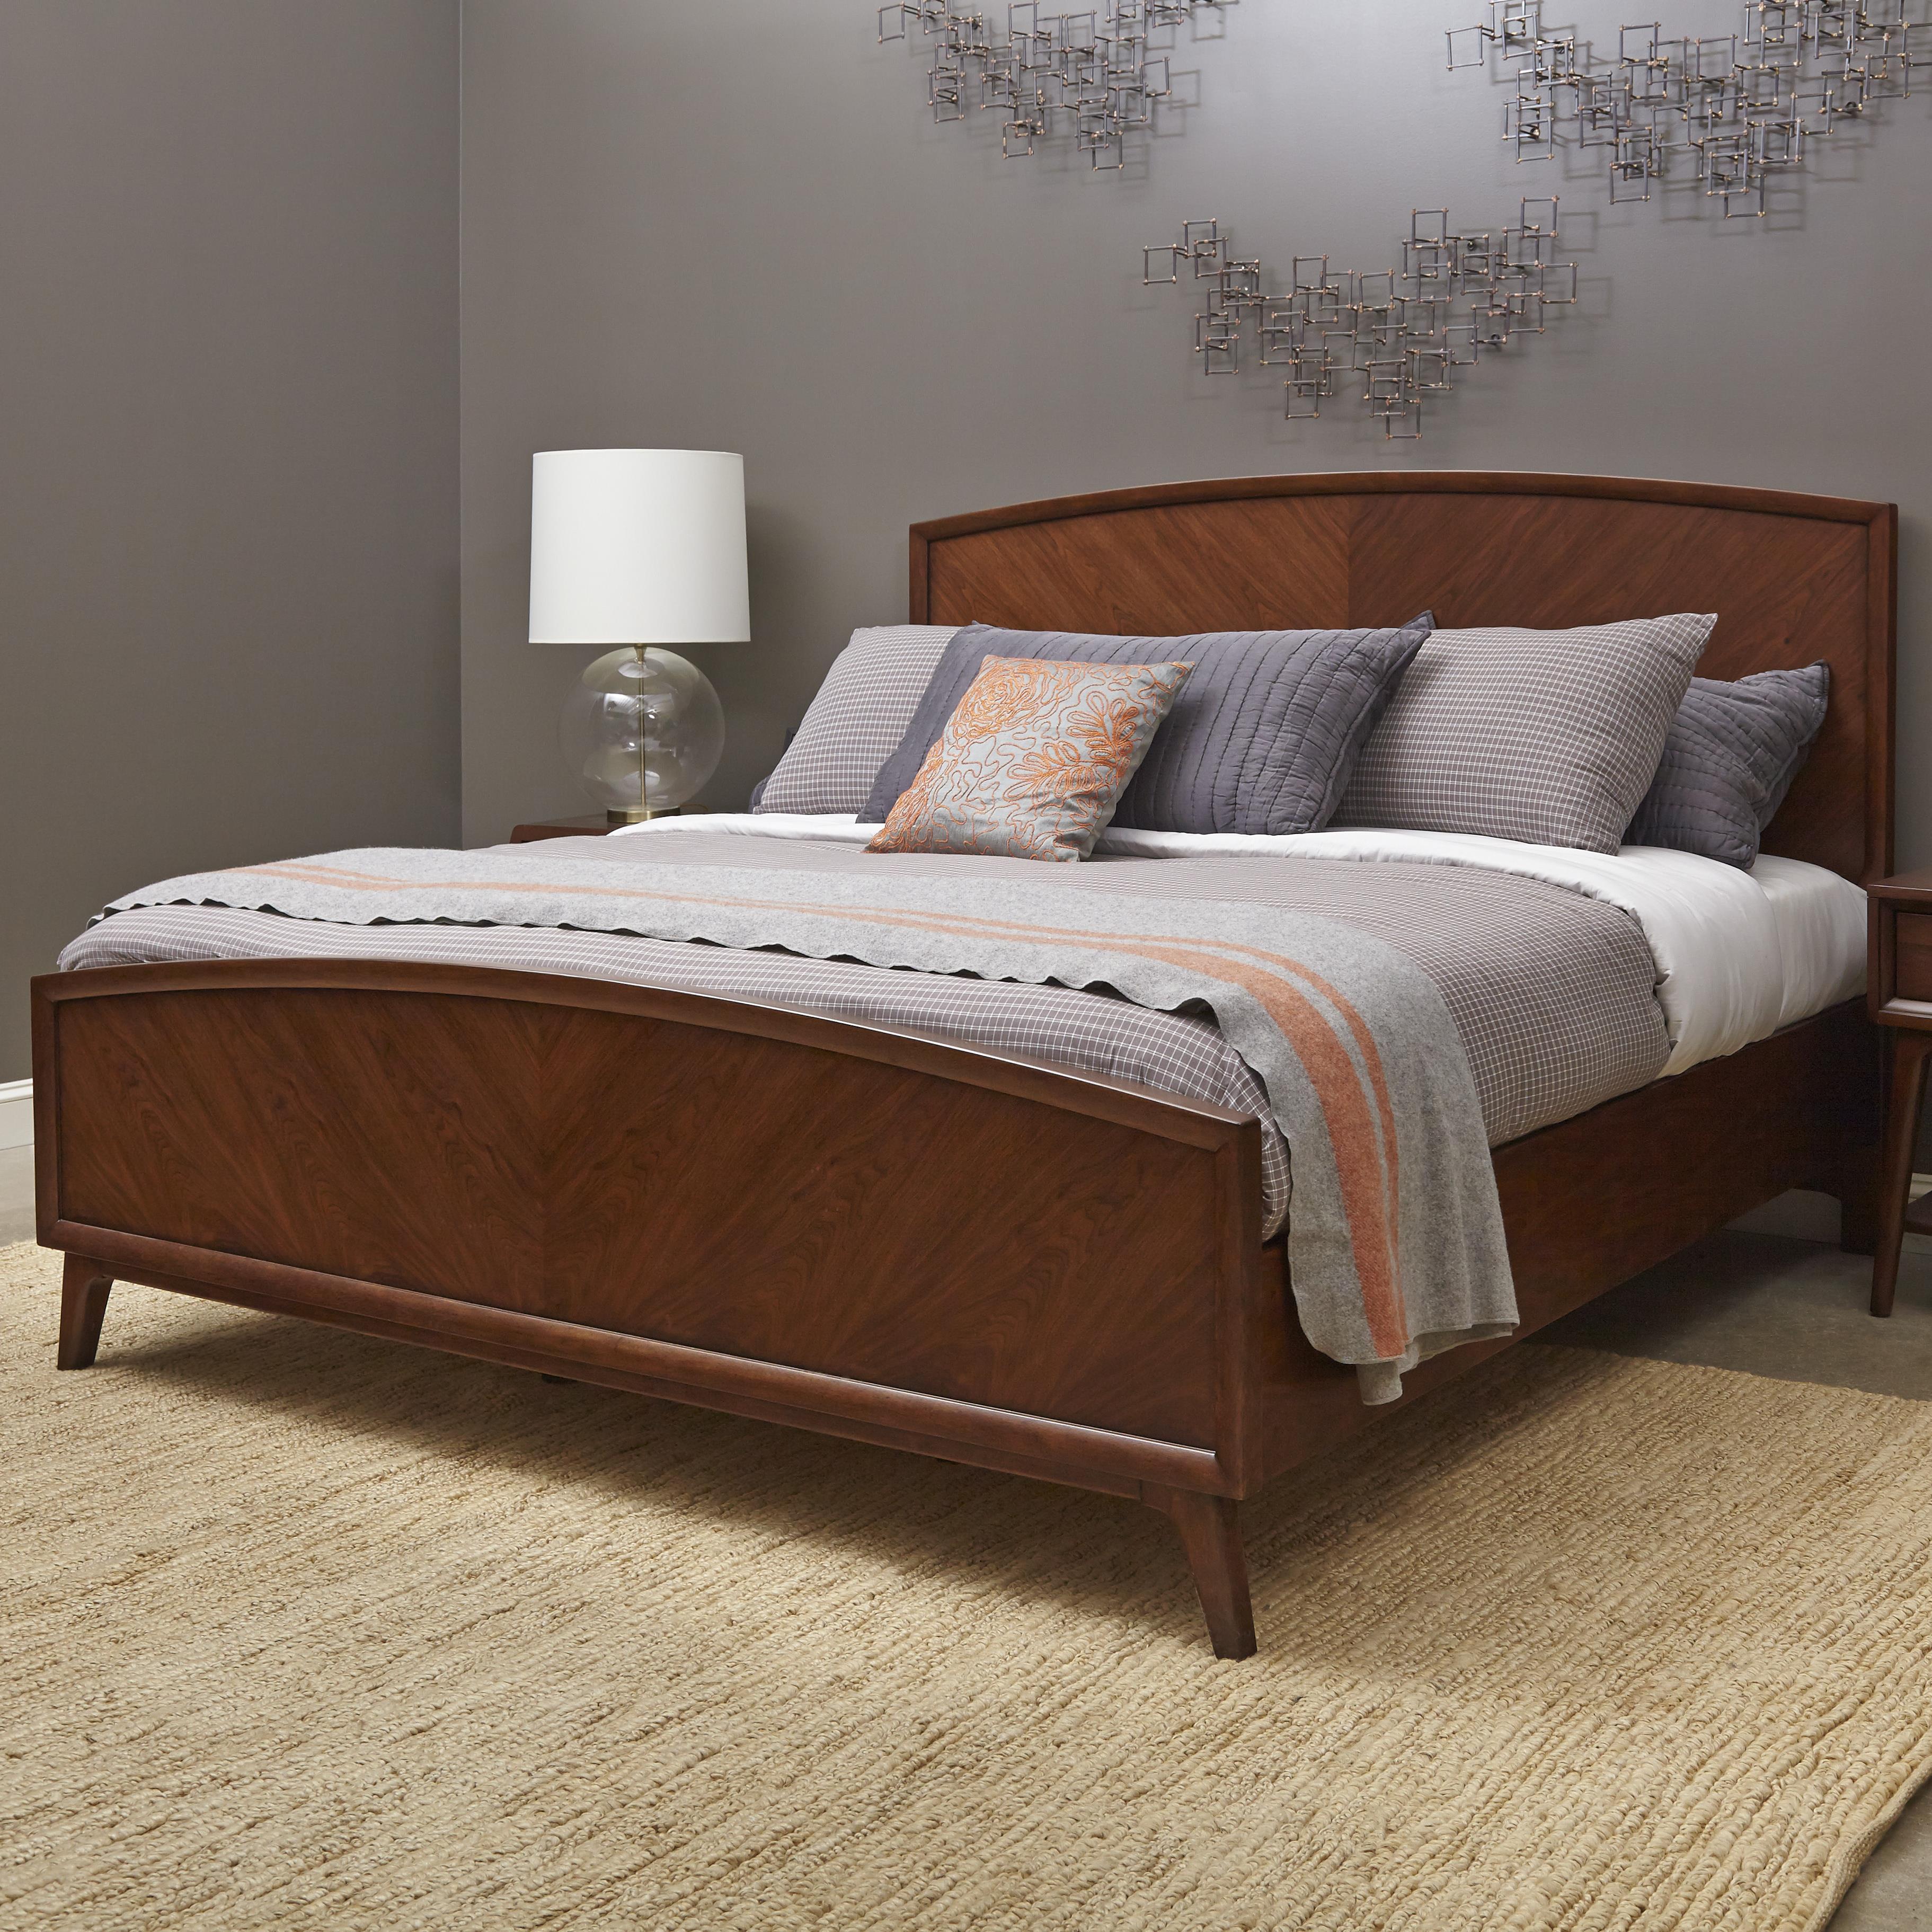 Pulaski Furniture Modern Harmony King Wood Bed - Item Number: 403160+161+152